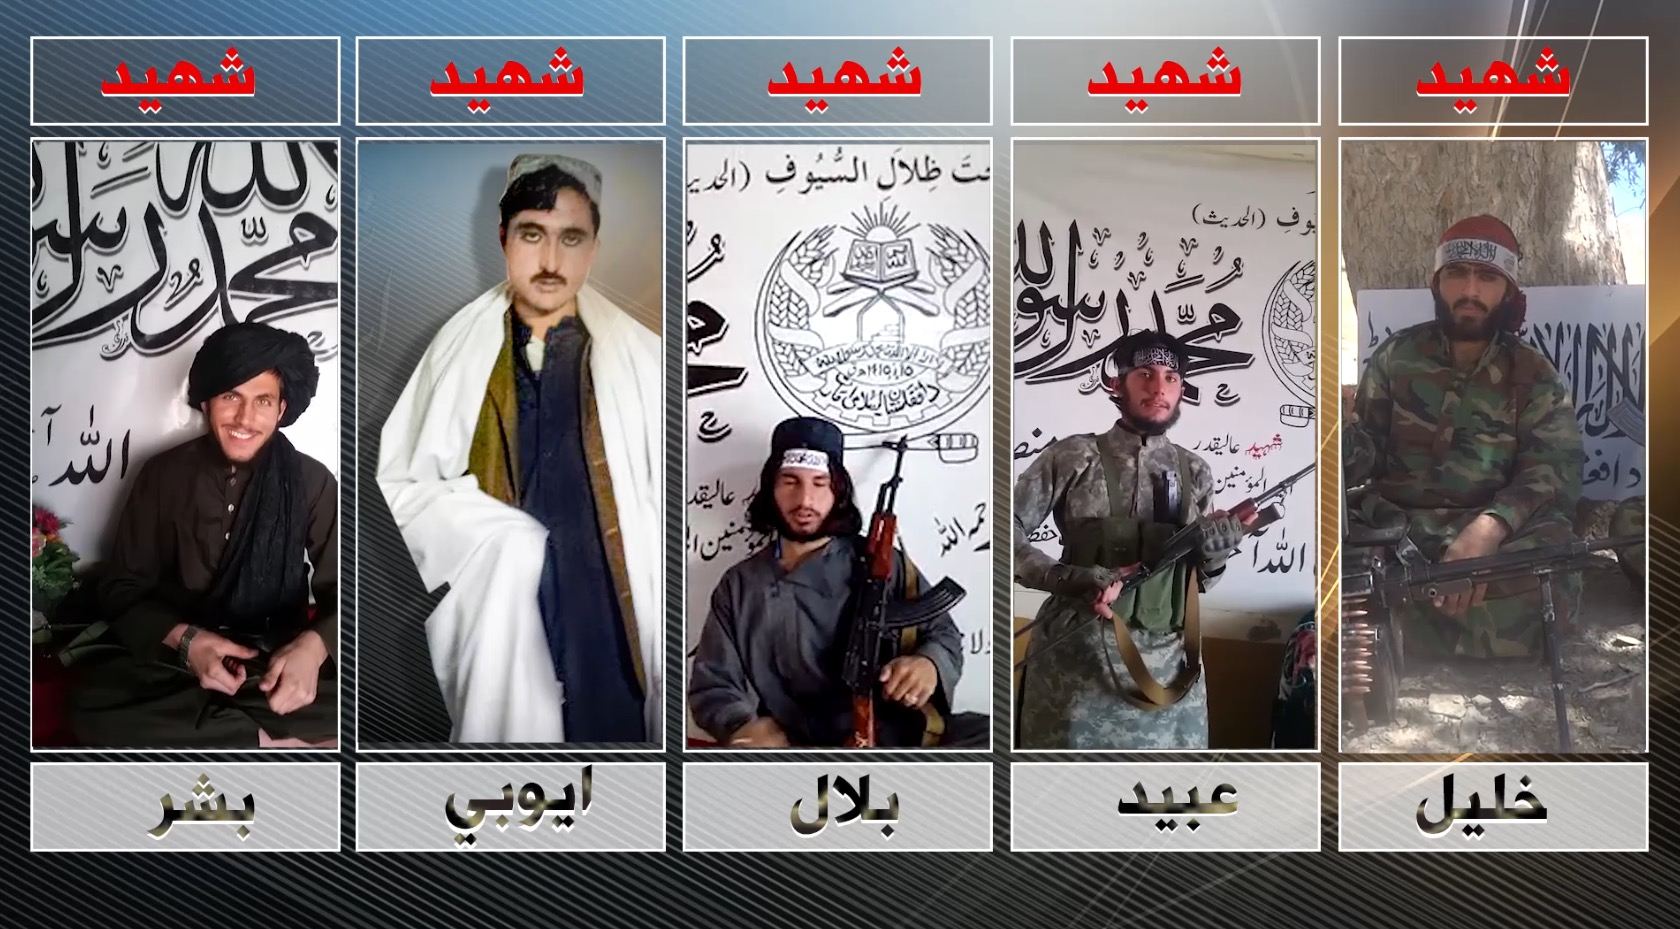 taliban3.jpg